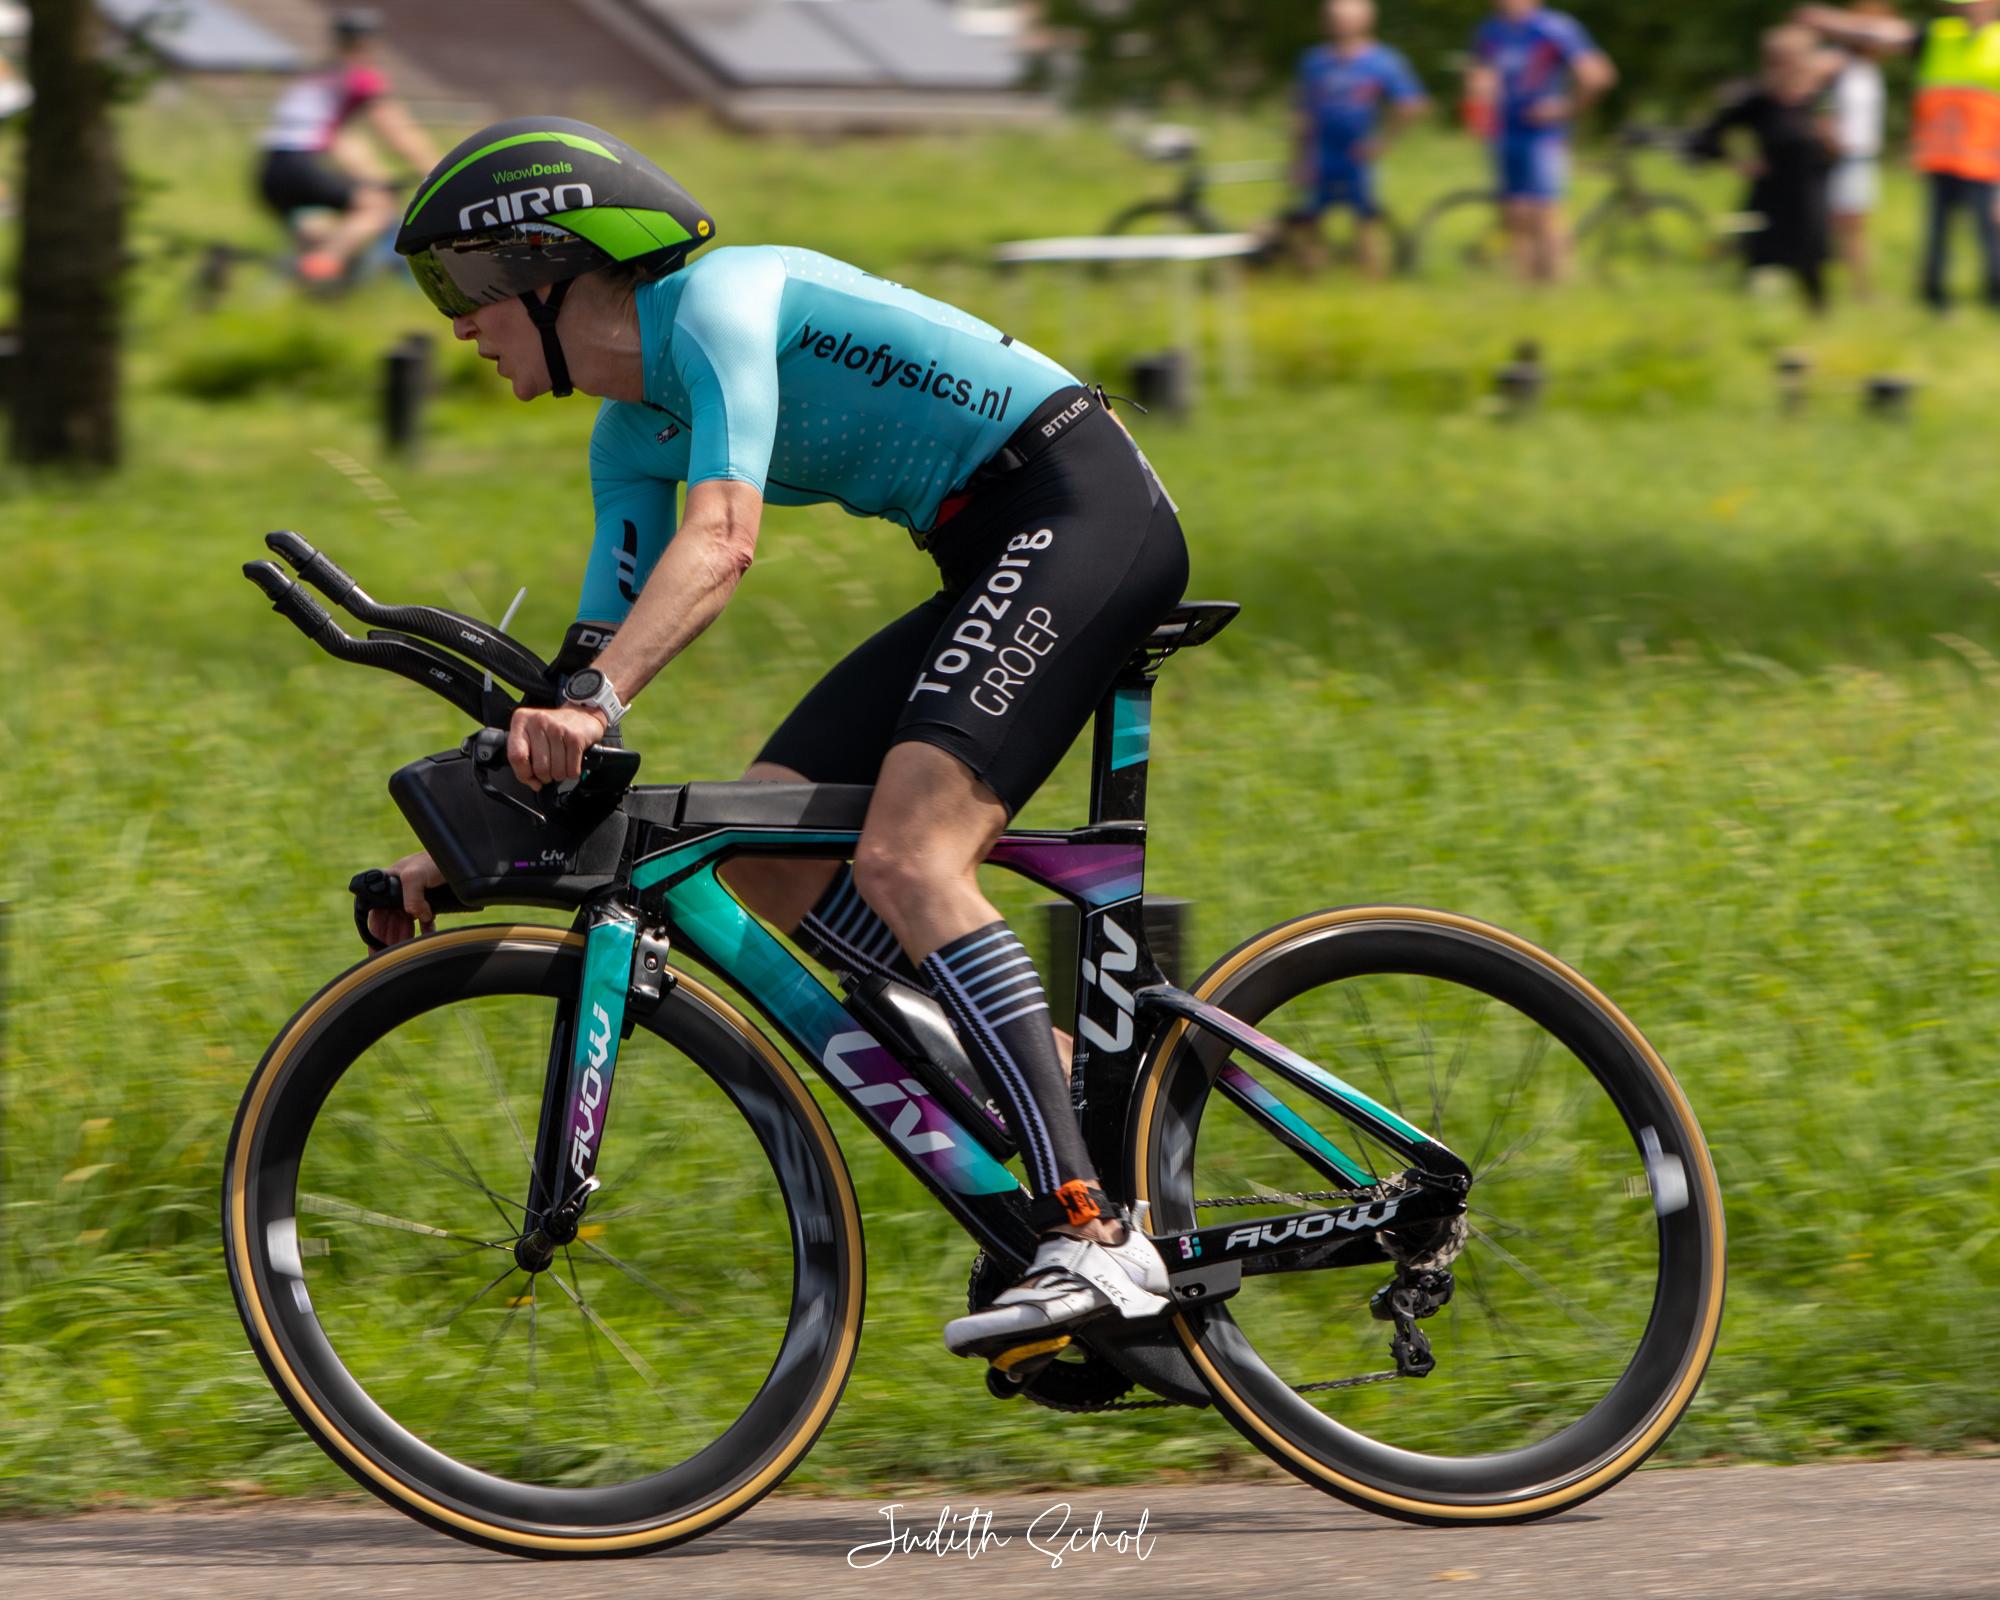 Giesbeek Triatlon 1582021jpg